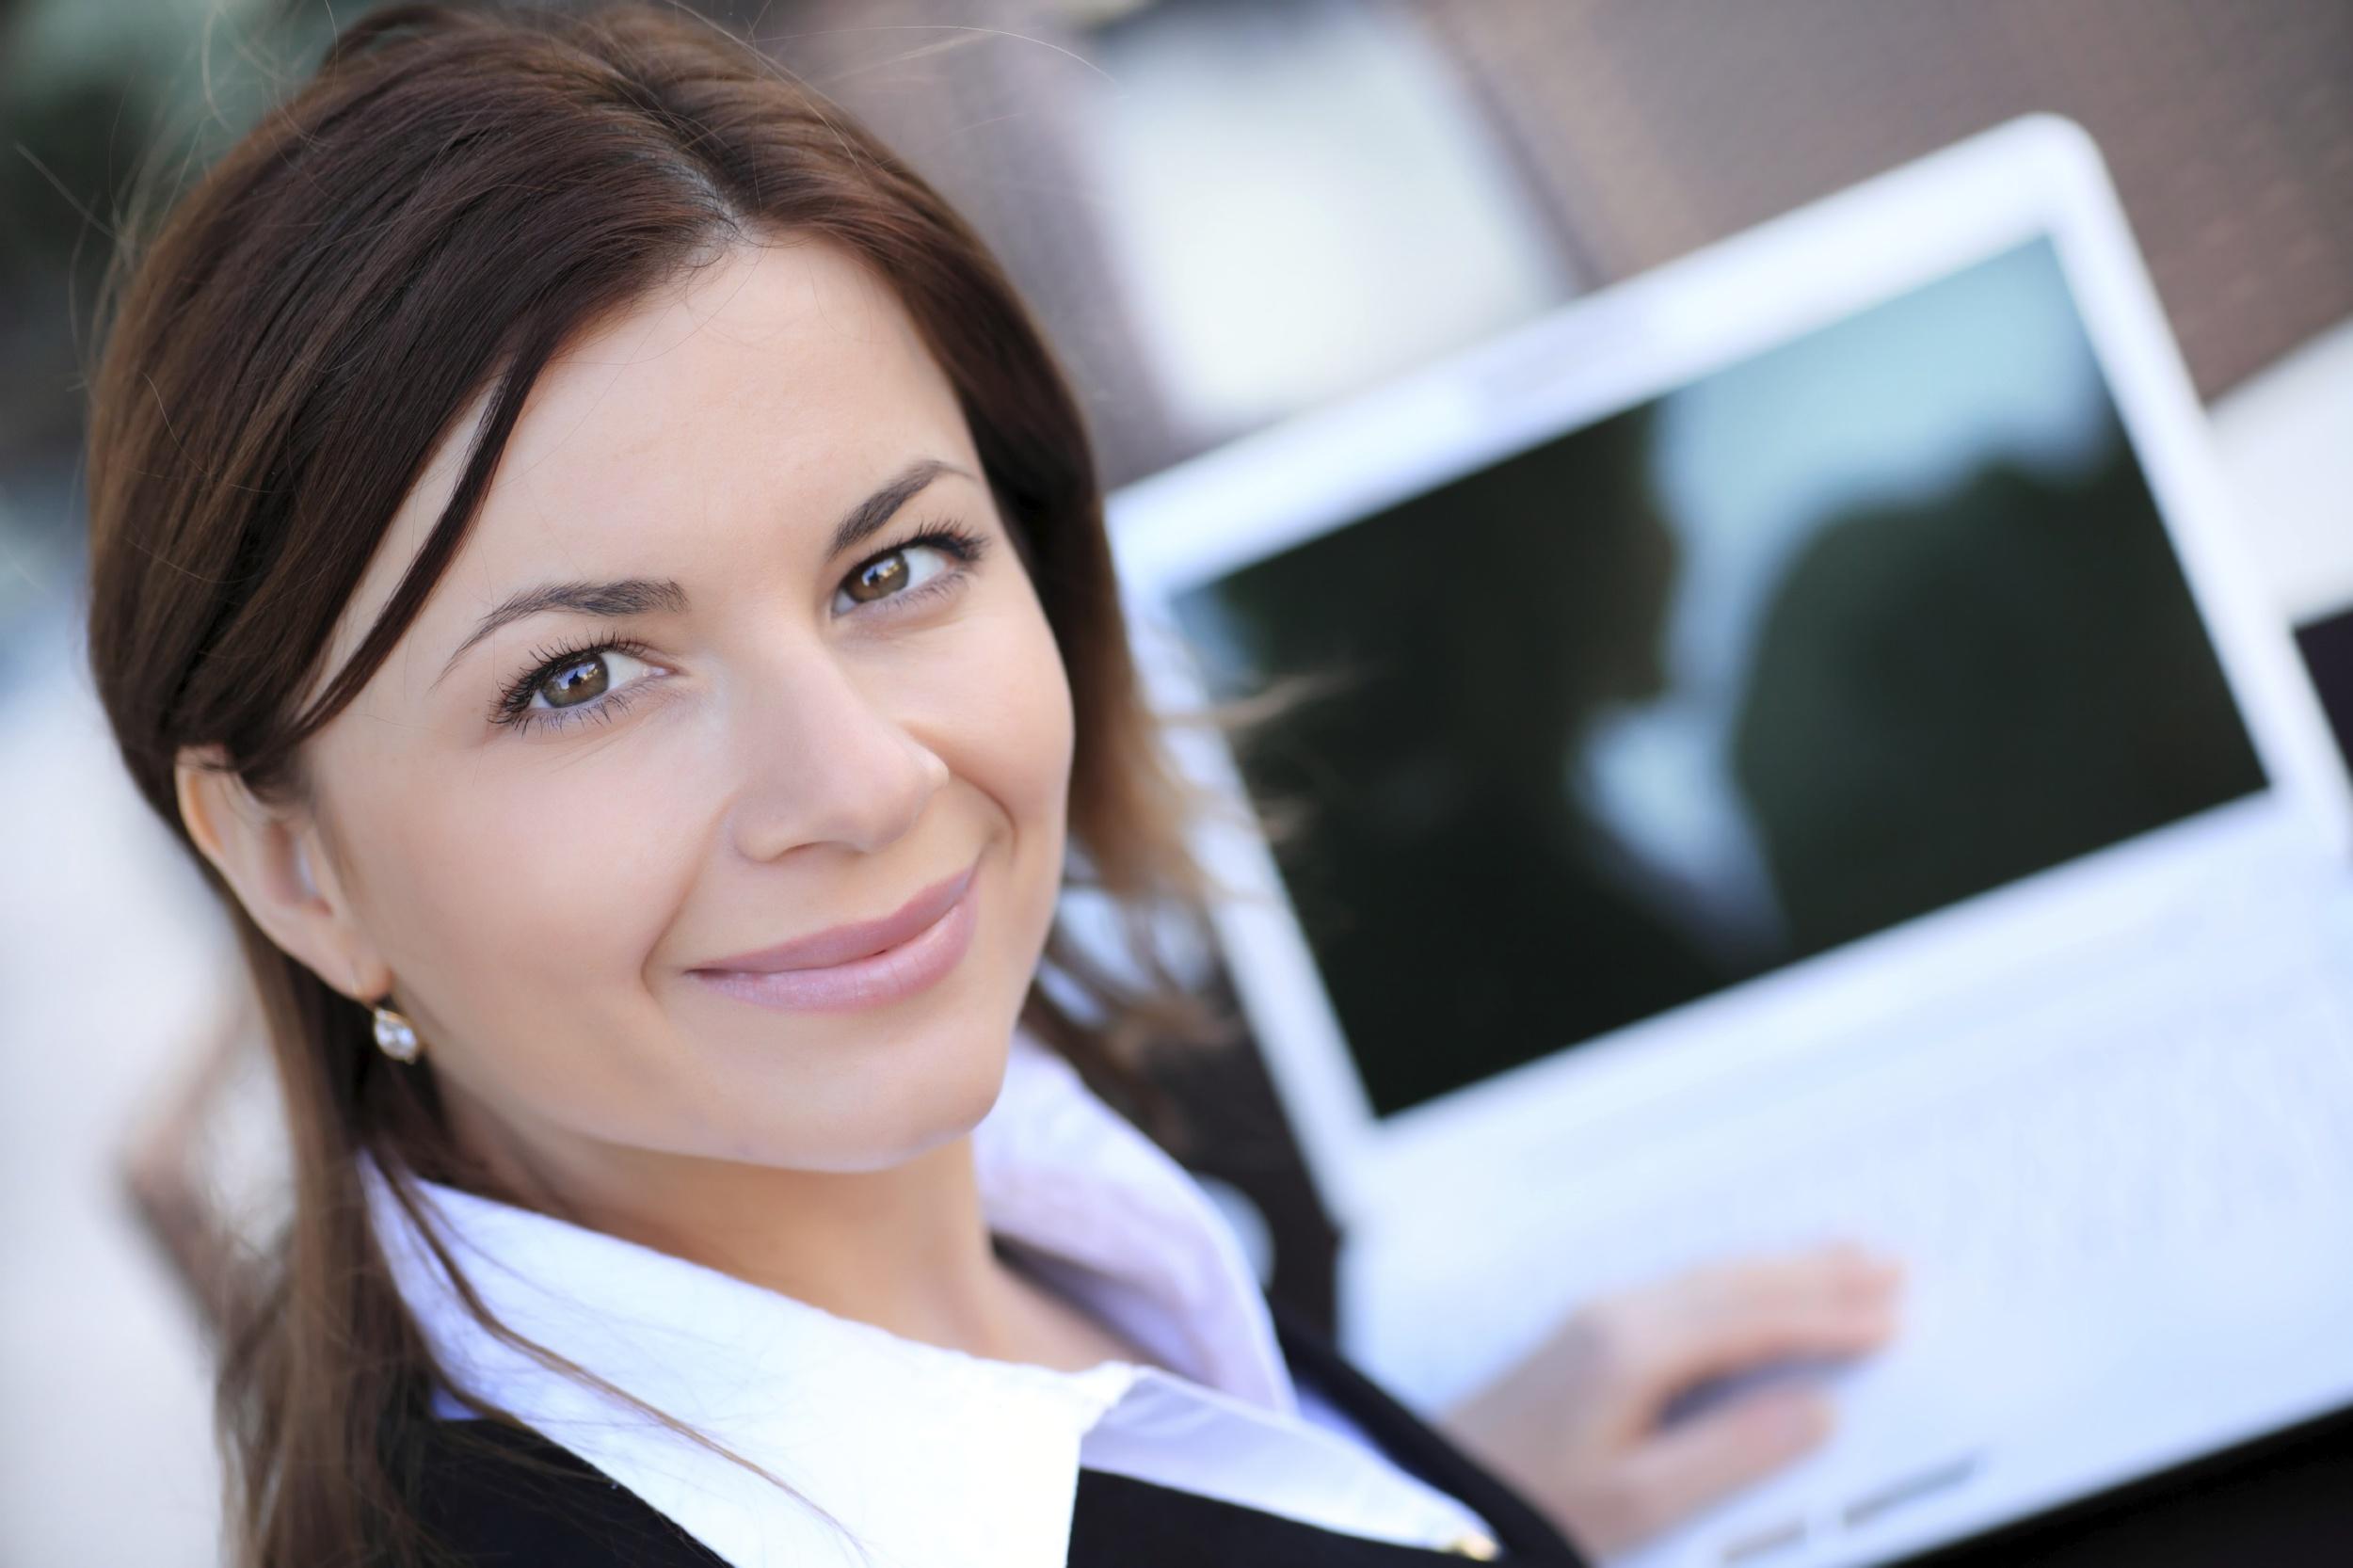 Business Woman Laptop.jpg